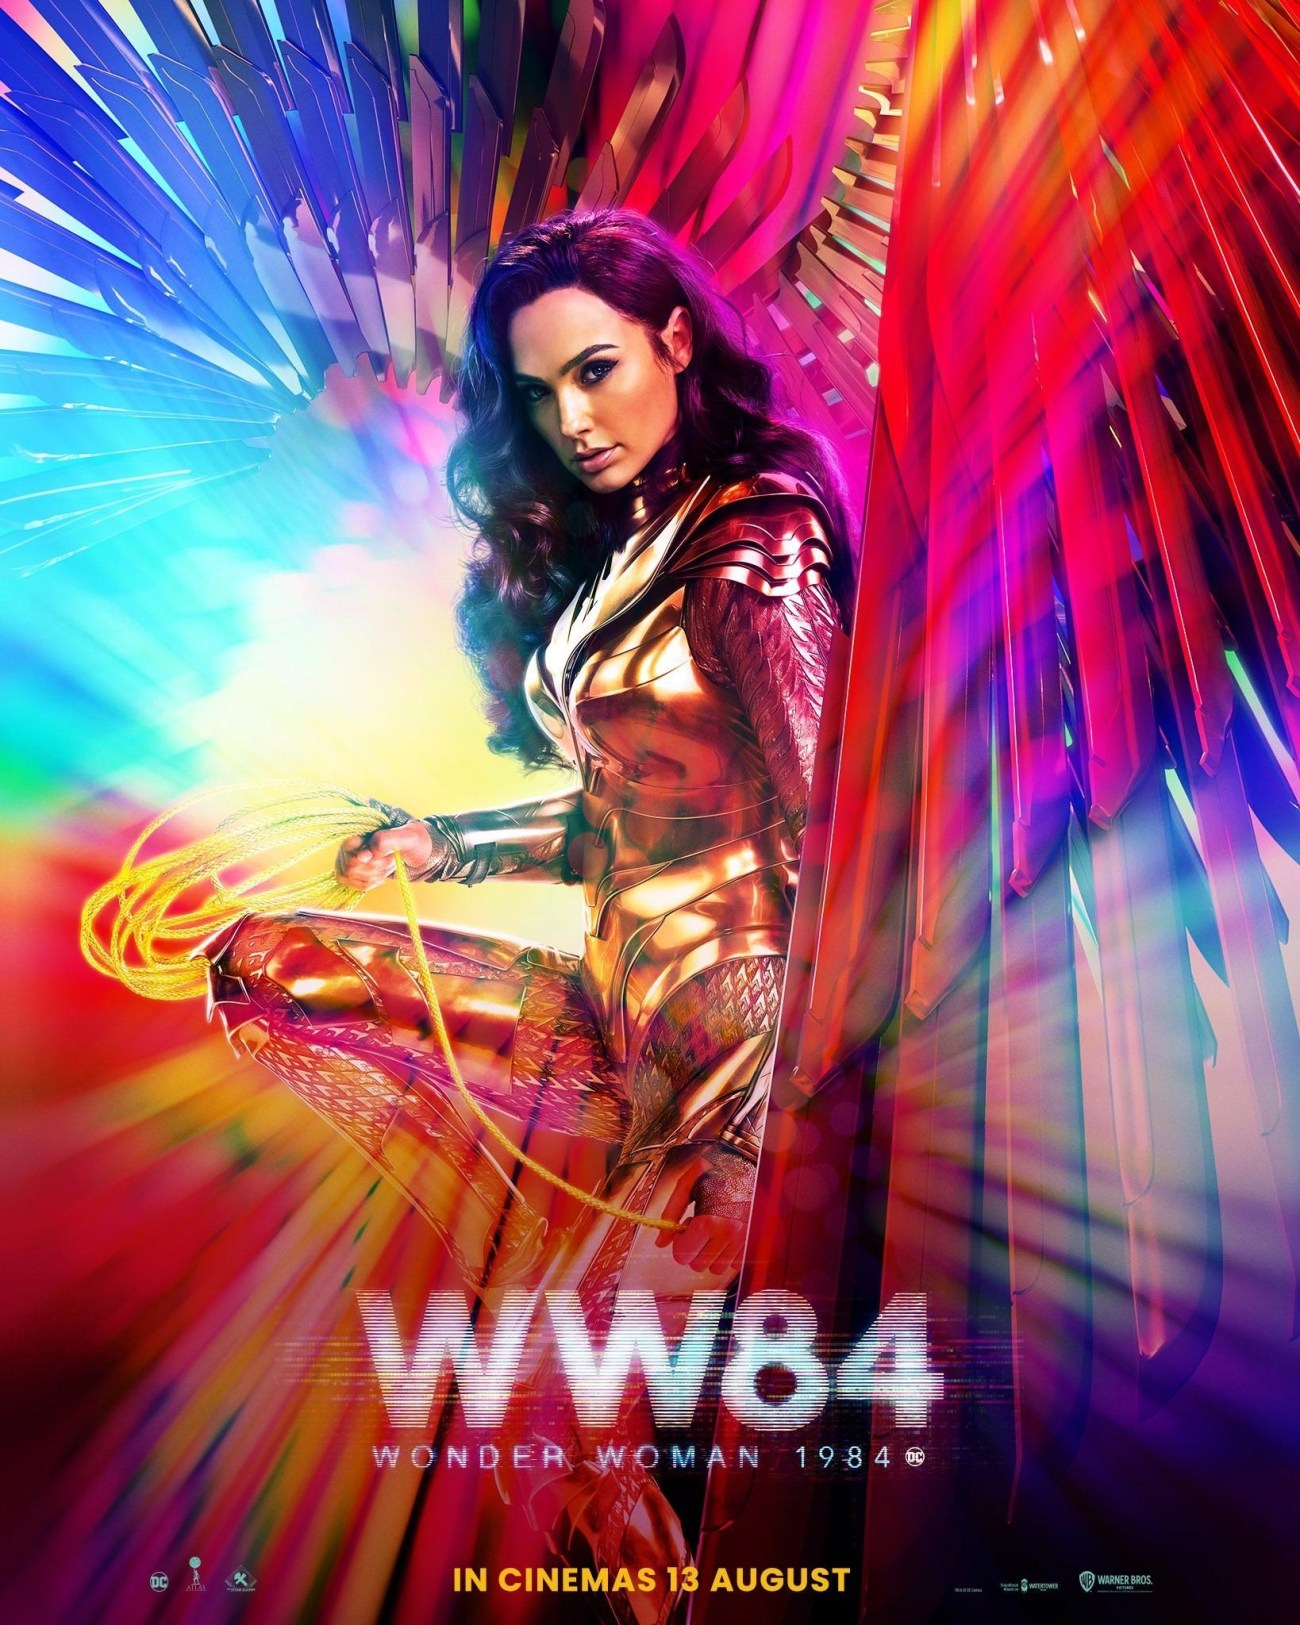 Póster de Wonder Woman 1984 (2020). Imagen: impawards.com